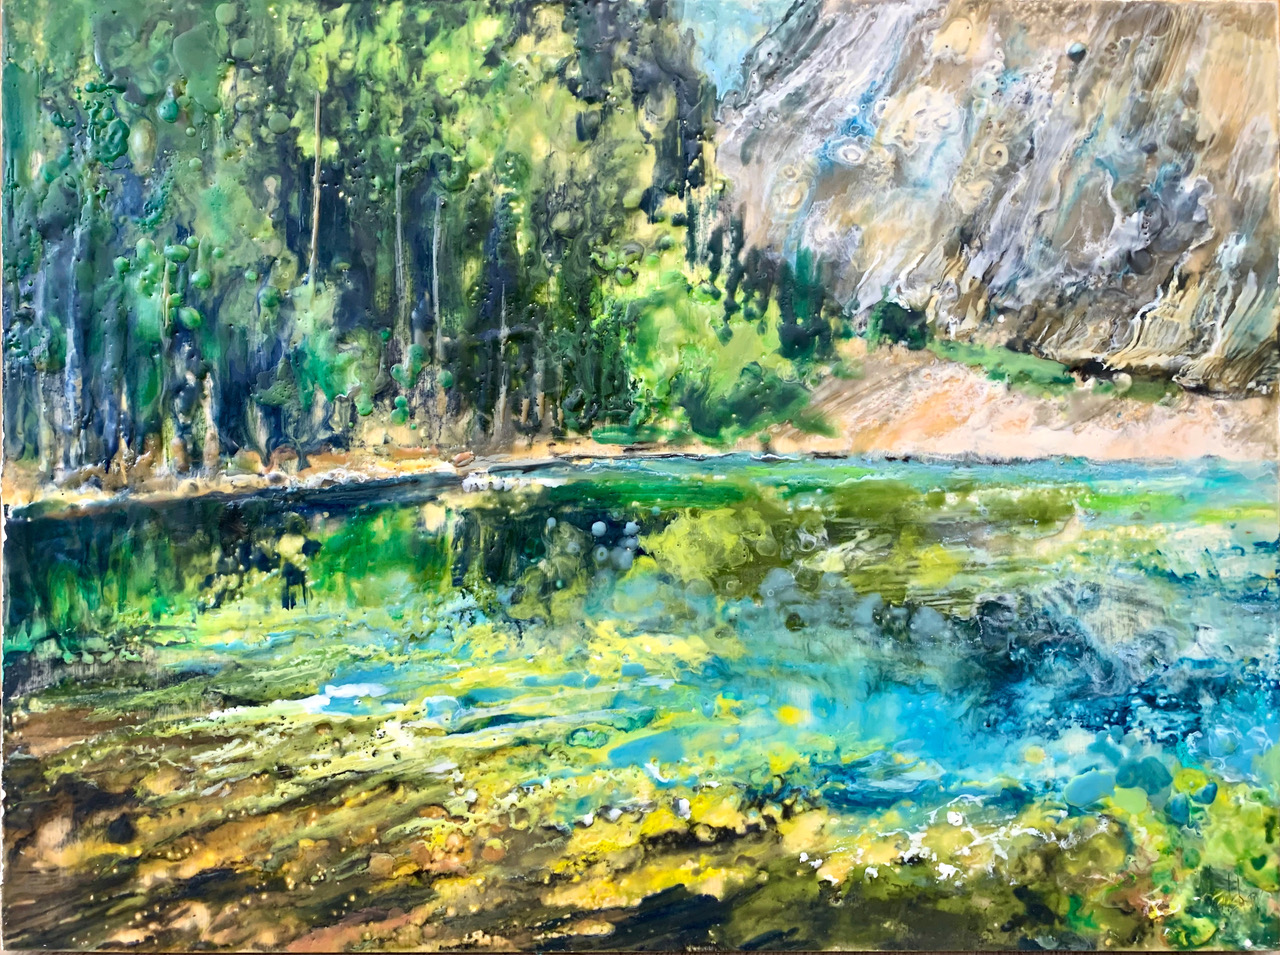 Grassi Lake by  Kathy Bradshaw - Masterpiece Online